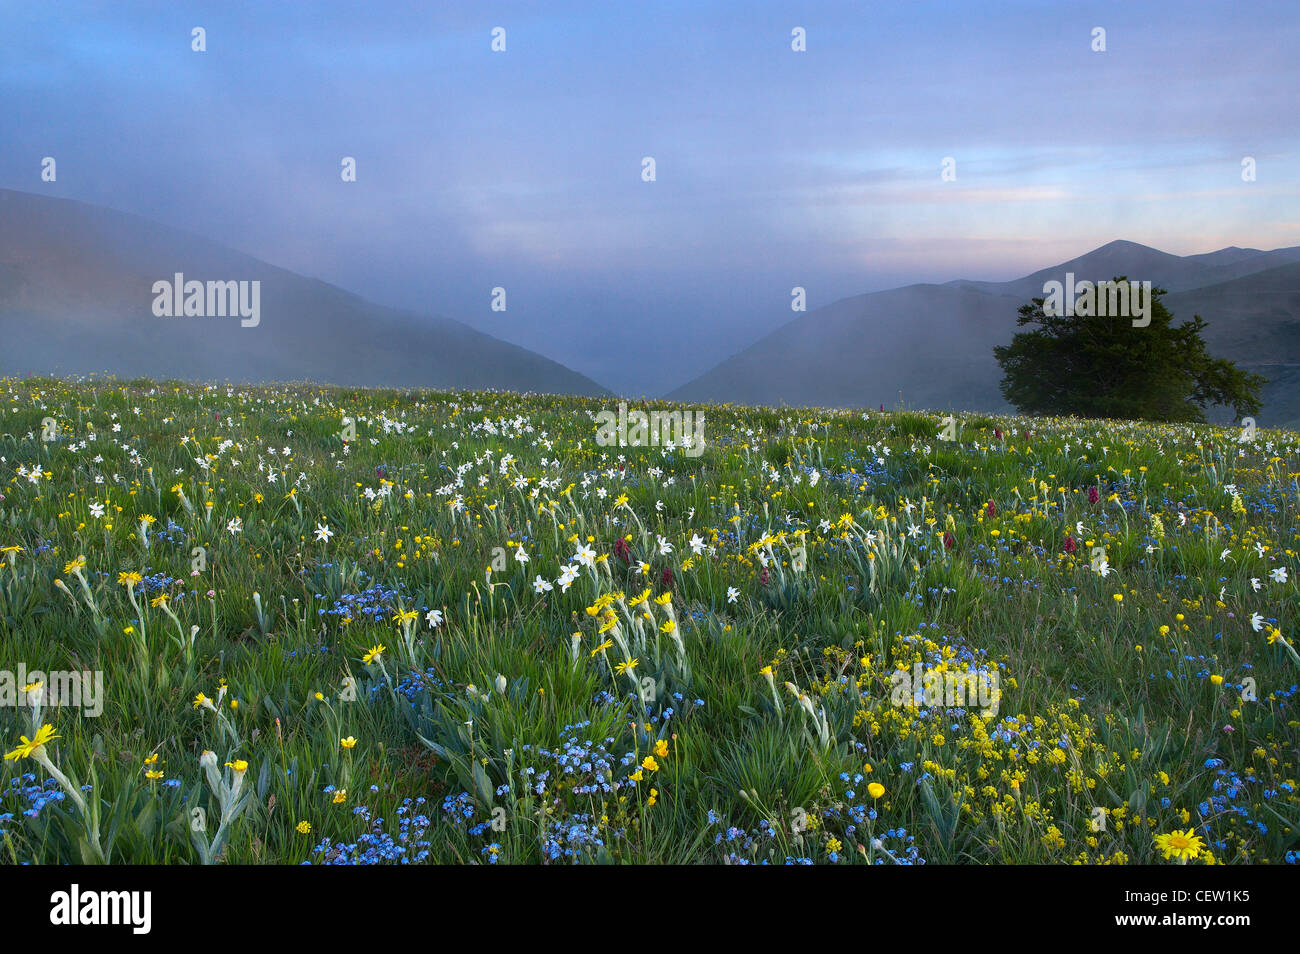 Flores silvestres creciendo a la Forca Canapine, Monti Sibillini National Park, Umbría, Italia. (NR) Foto de stock